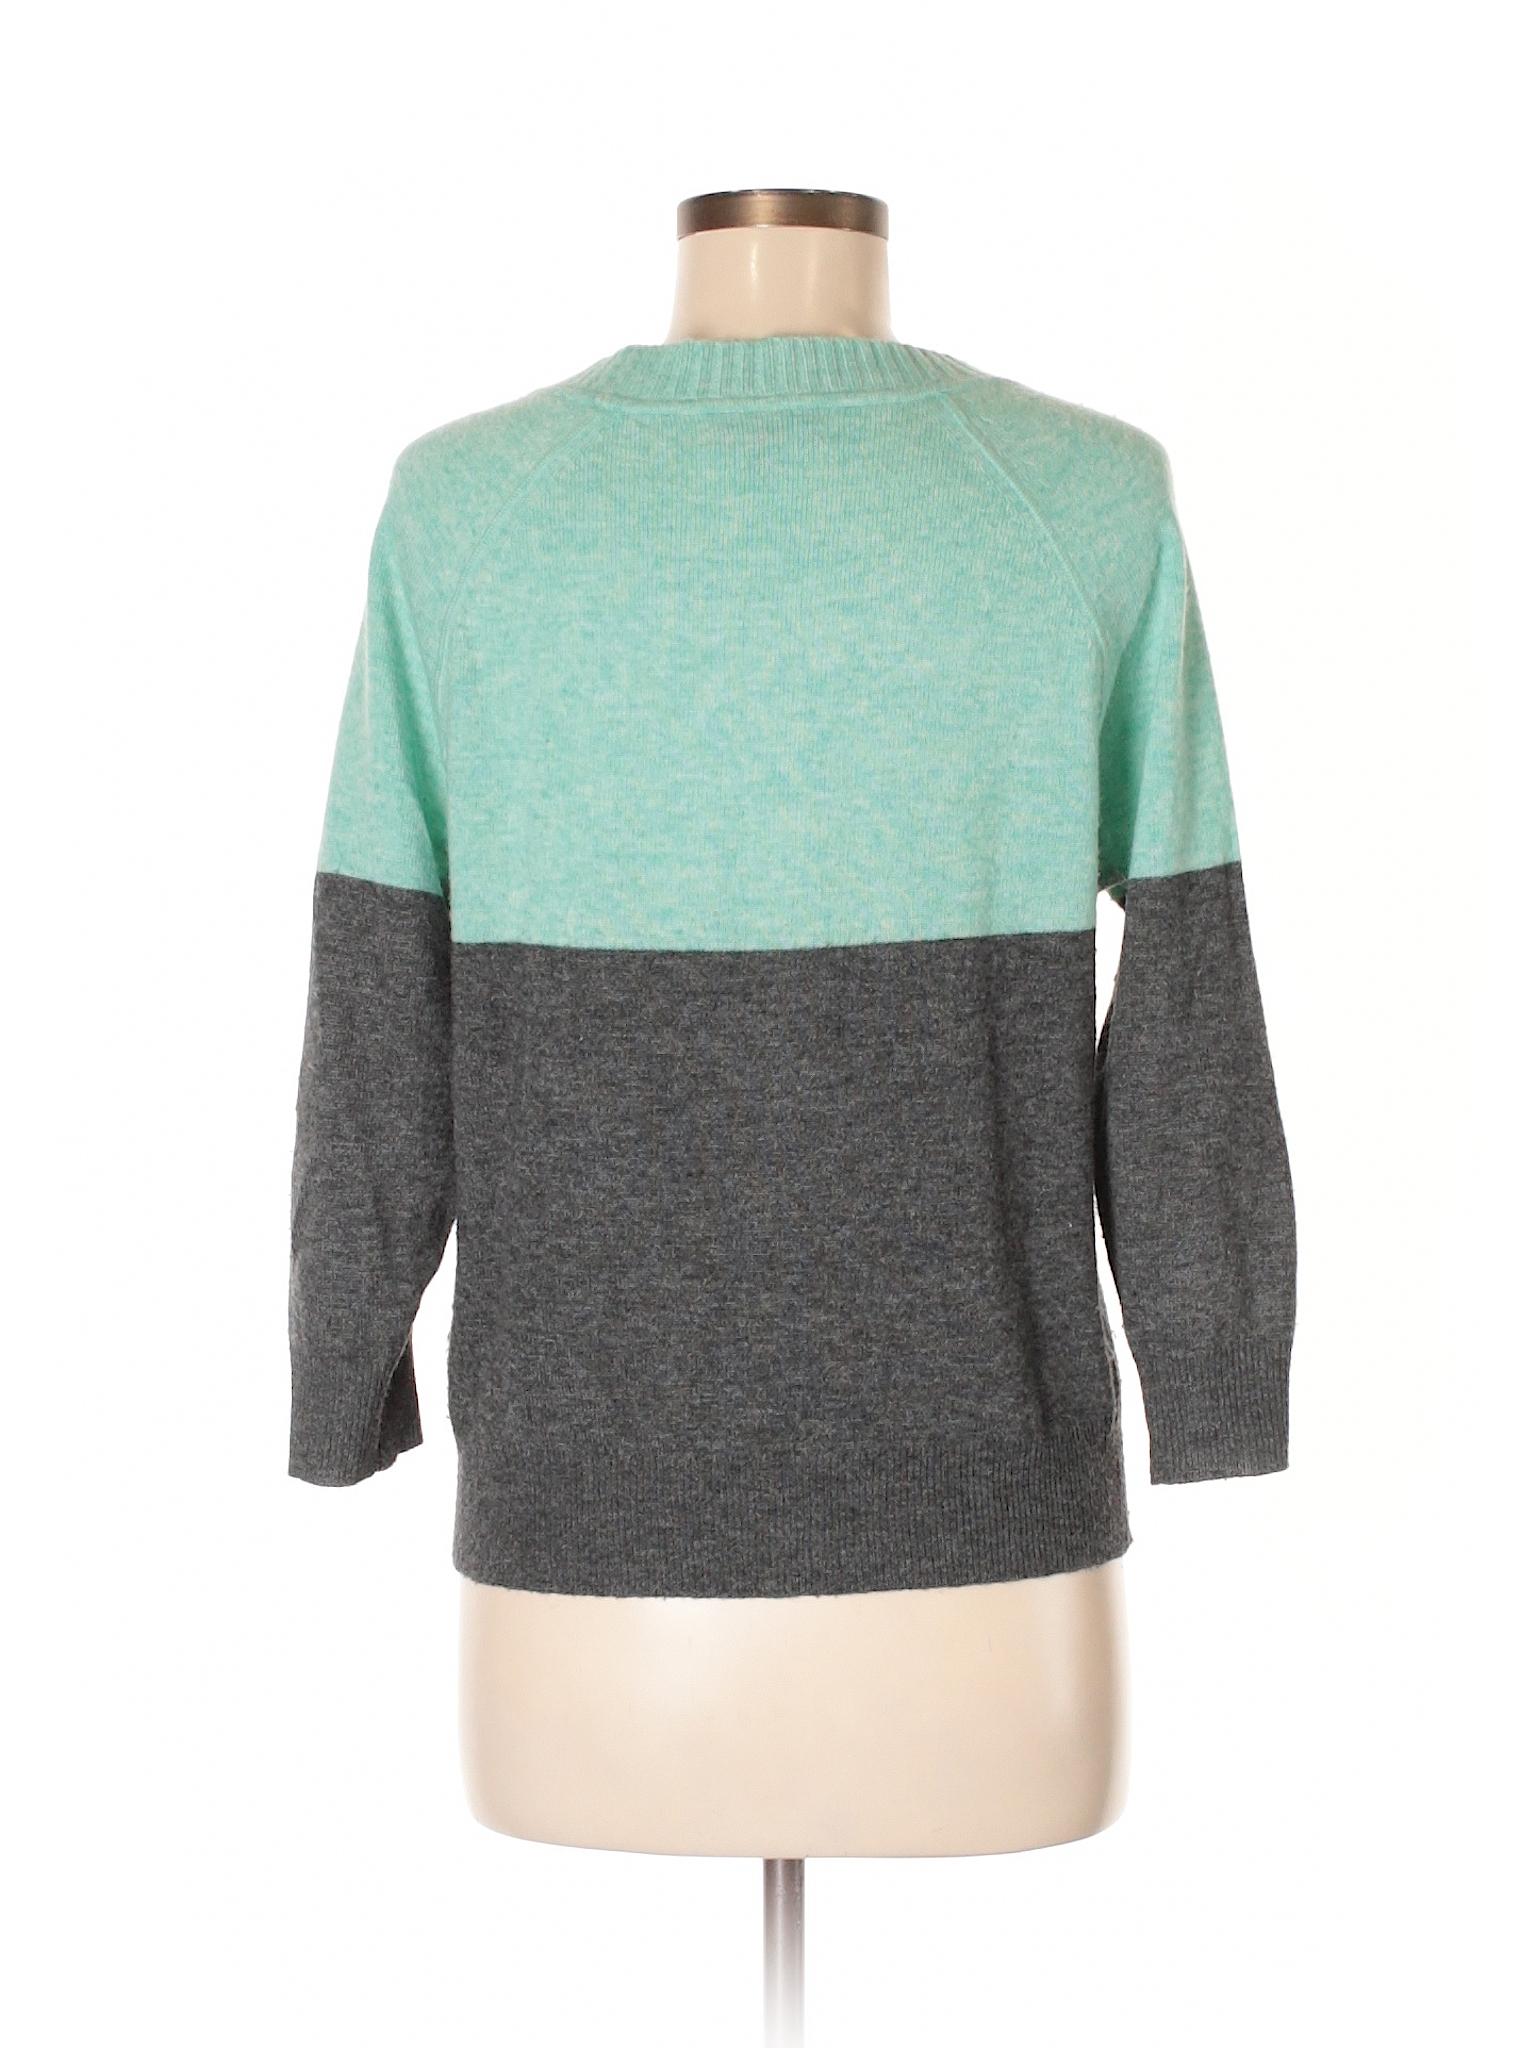 Boutique Cashmere Sweater J Crew Pullover pwUaTCnprq